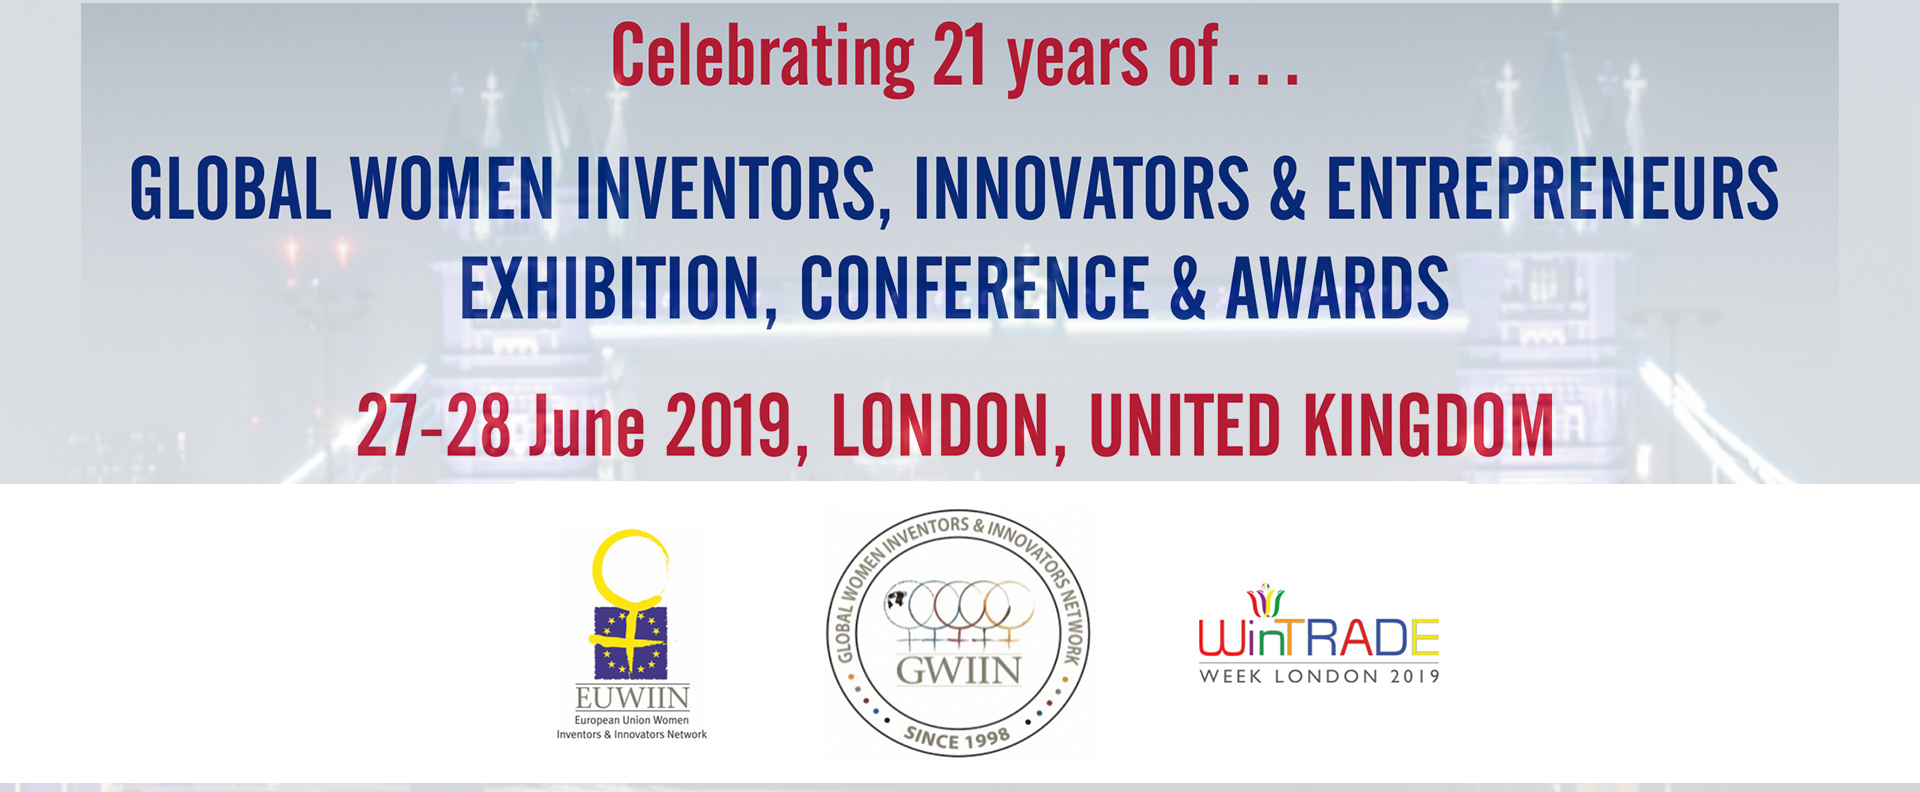 Celebrating 21 years of GLOBAL WOMEN INVENTORS, INNOVATORS & ENTREPRENEURS EXHIBITION, CONFERENCE & AWARDS 27-28 June 2019, LONDON, UNITED KINGDOM